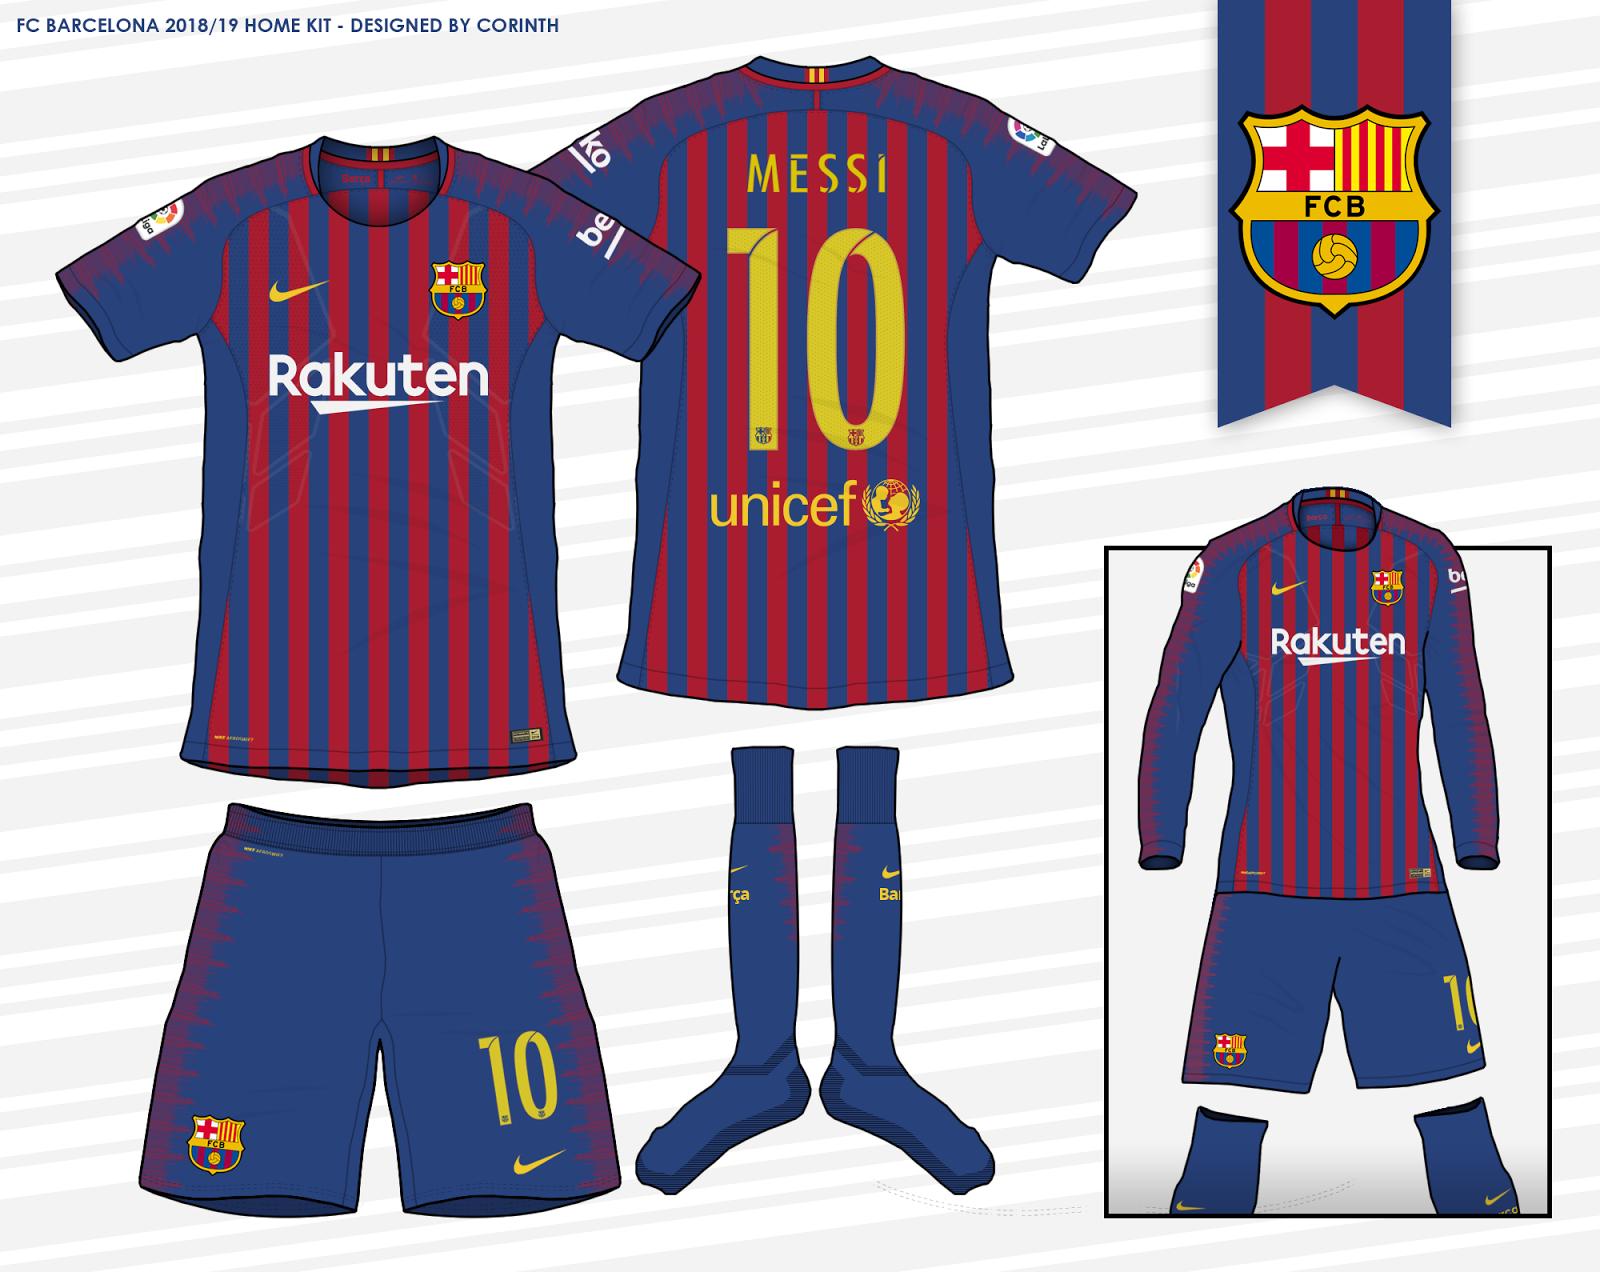 Jersey Kit Dls 19 Barcelona | 96 league soccer kits emblema